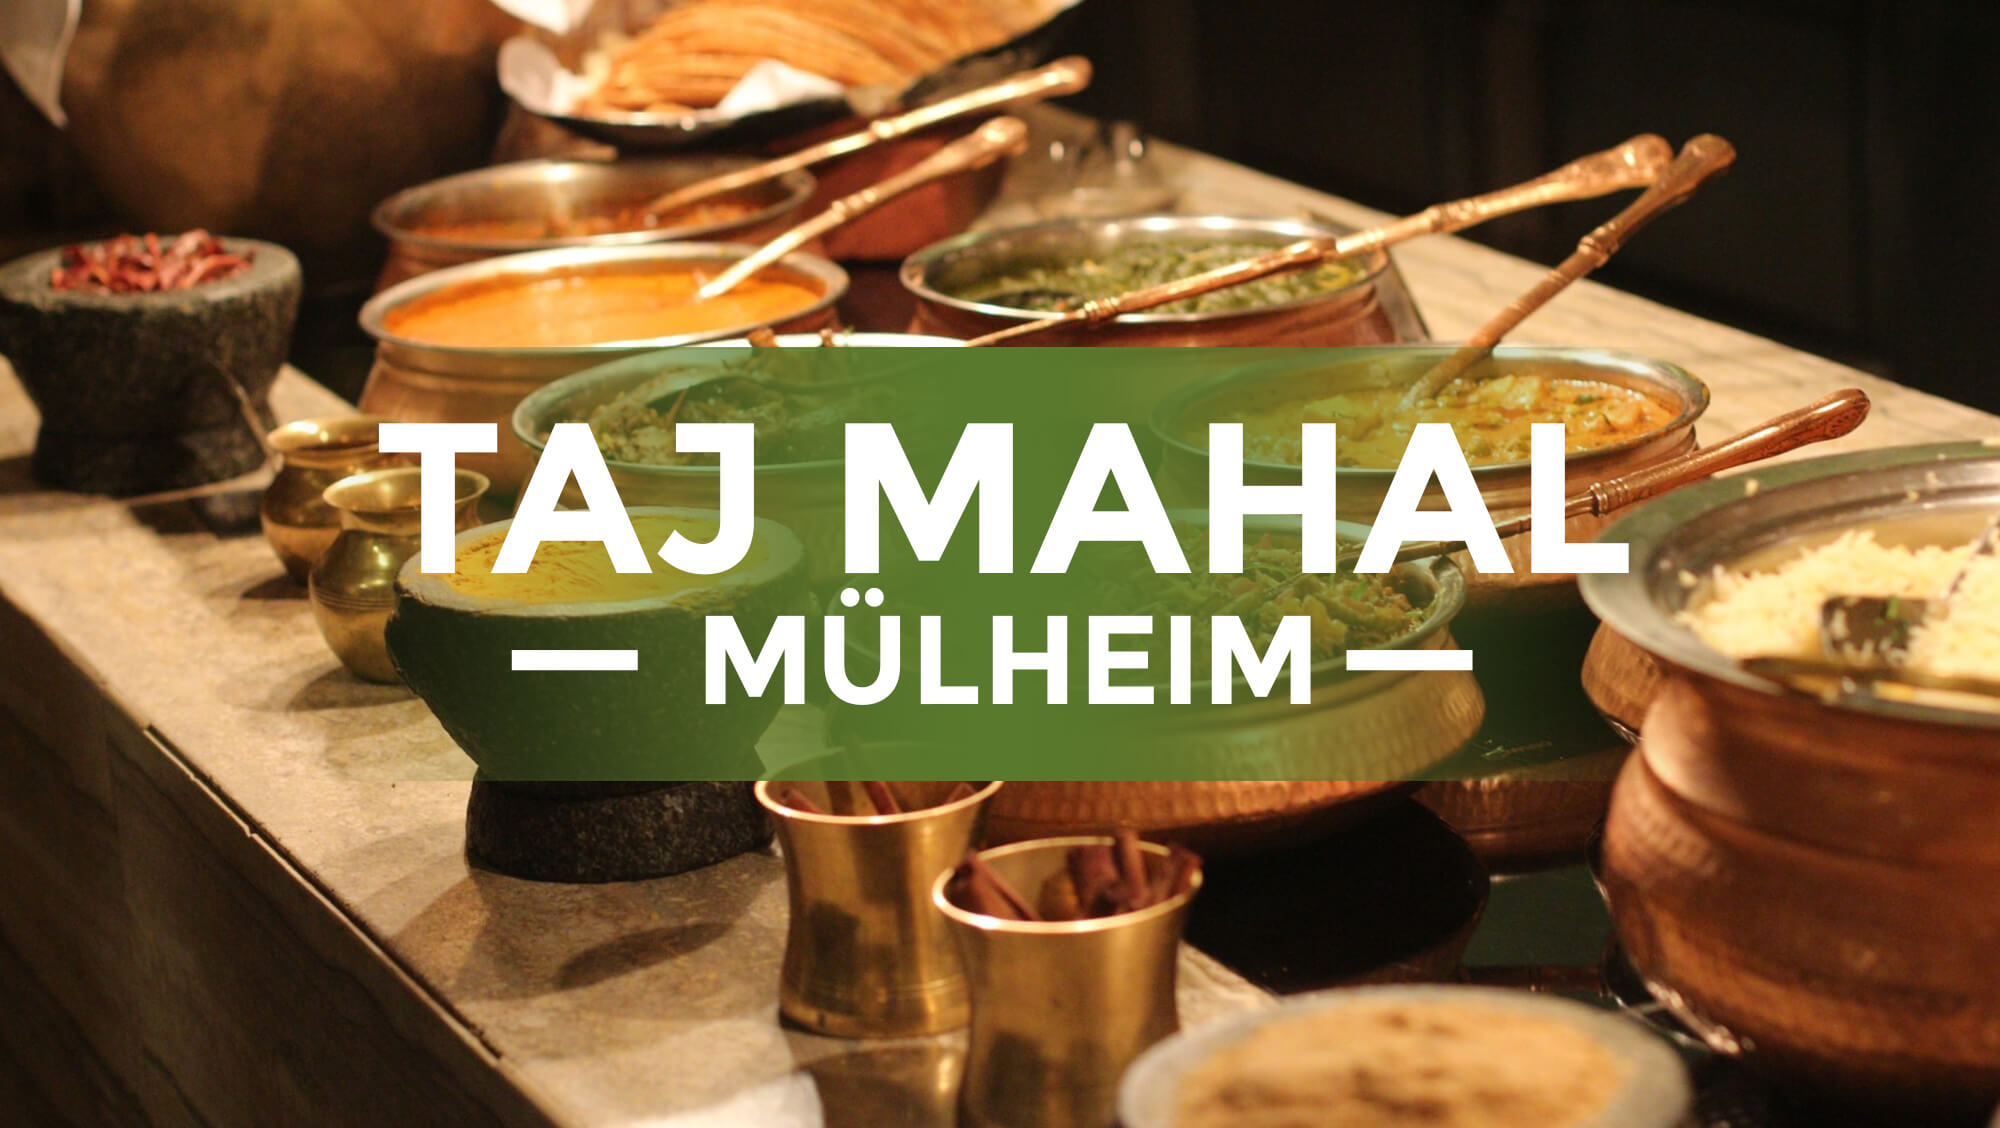 Brandcrock-Taj Mahal Restaurant-portfolio-header img